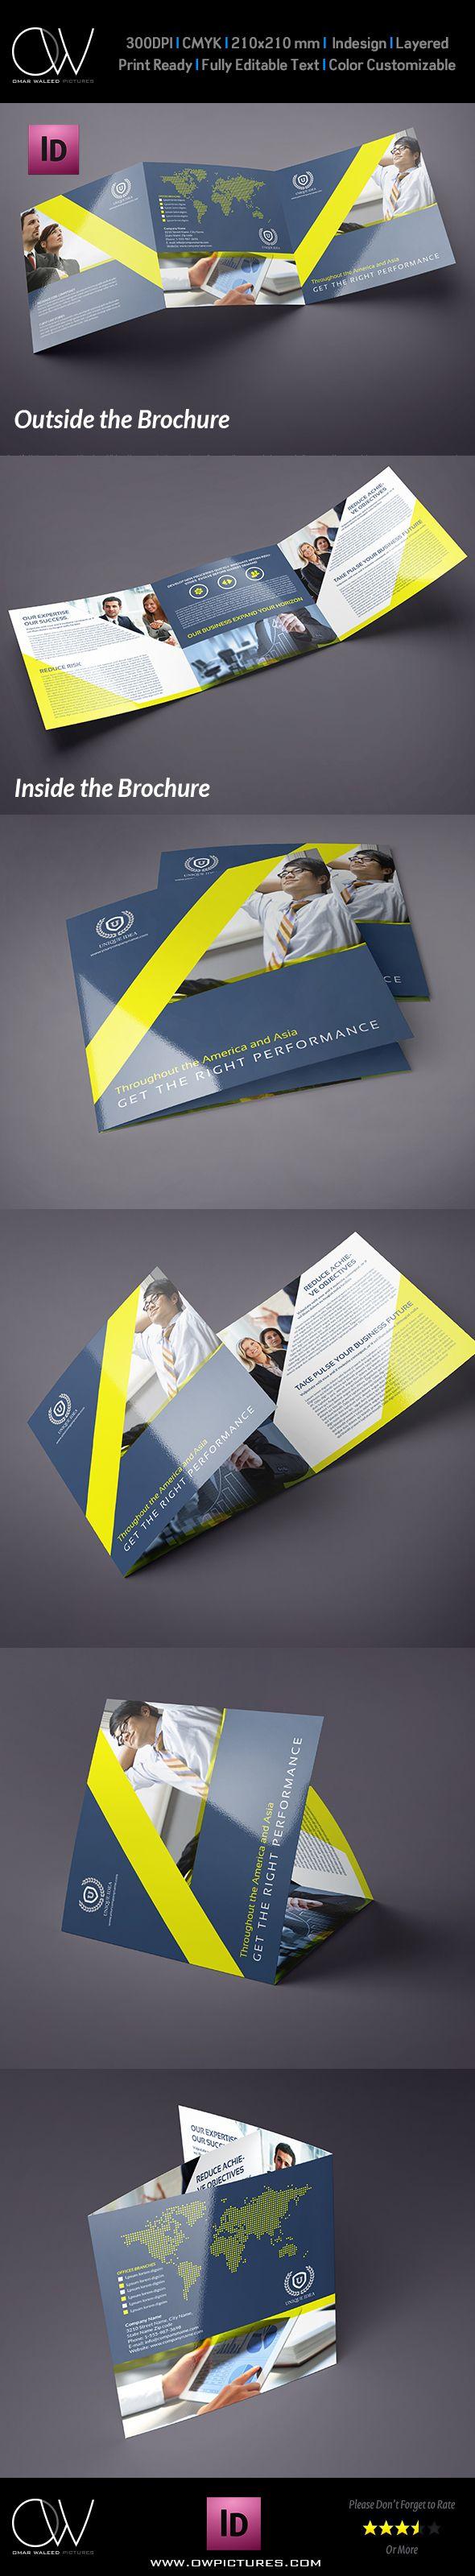 Company Brochure Tri-Fold Square Brochure Vol.8 on Behance